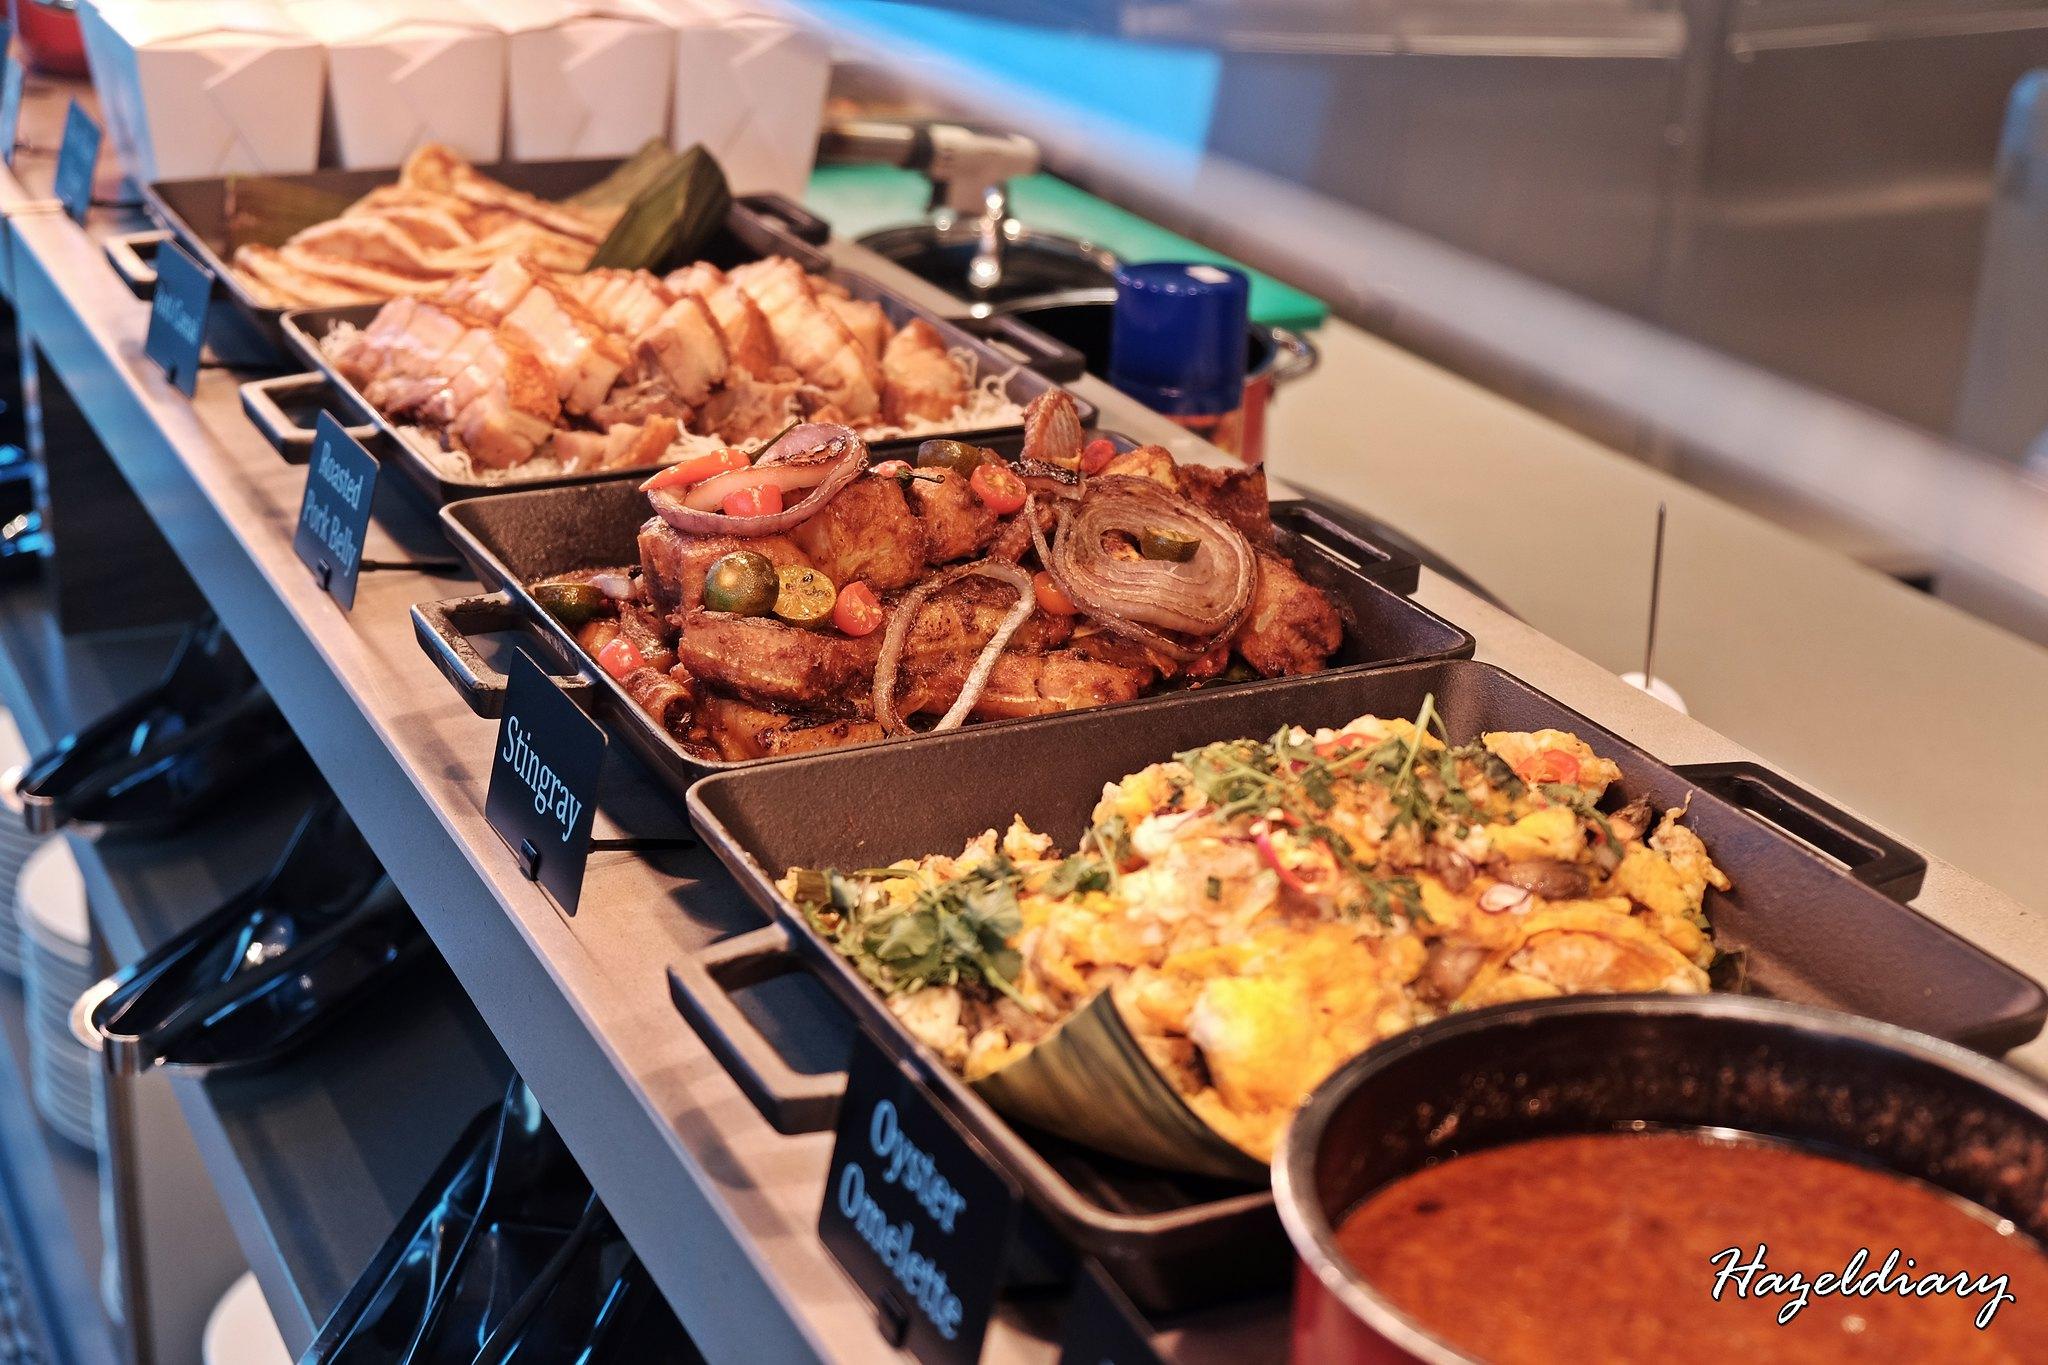 Penang Food Fare Buffet-Sky22 Courtyard Marriott-Hazeldiary-1